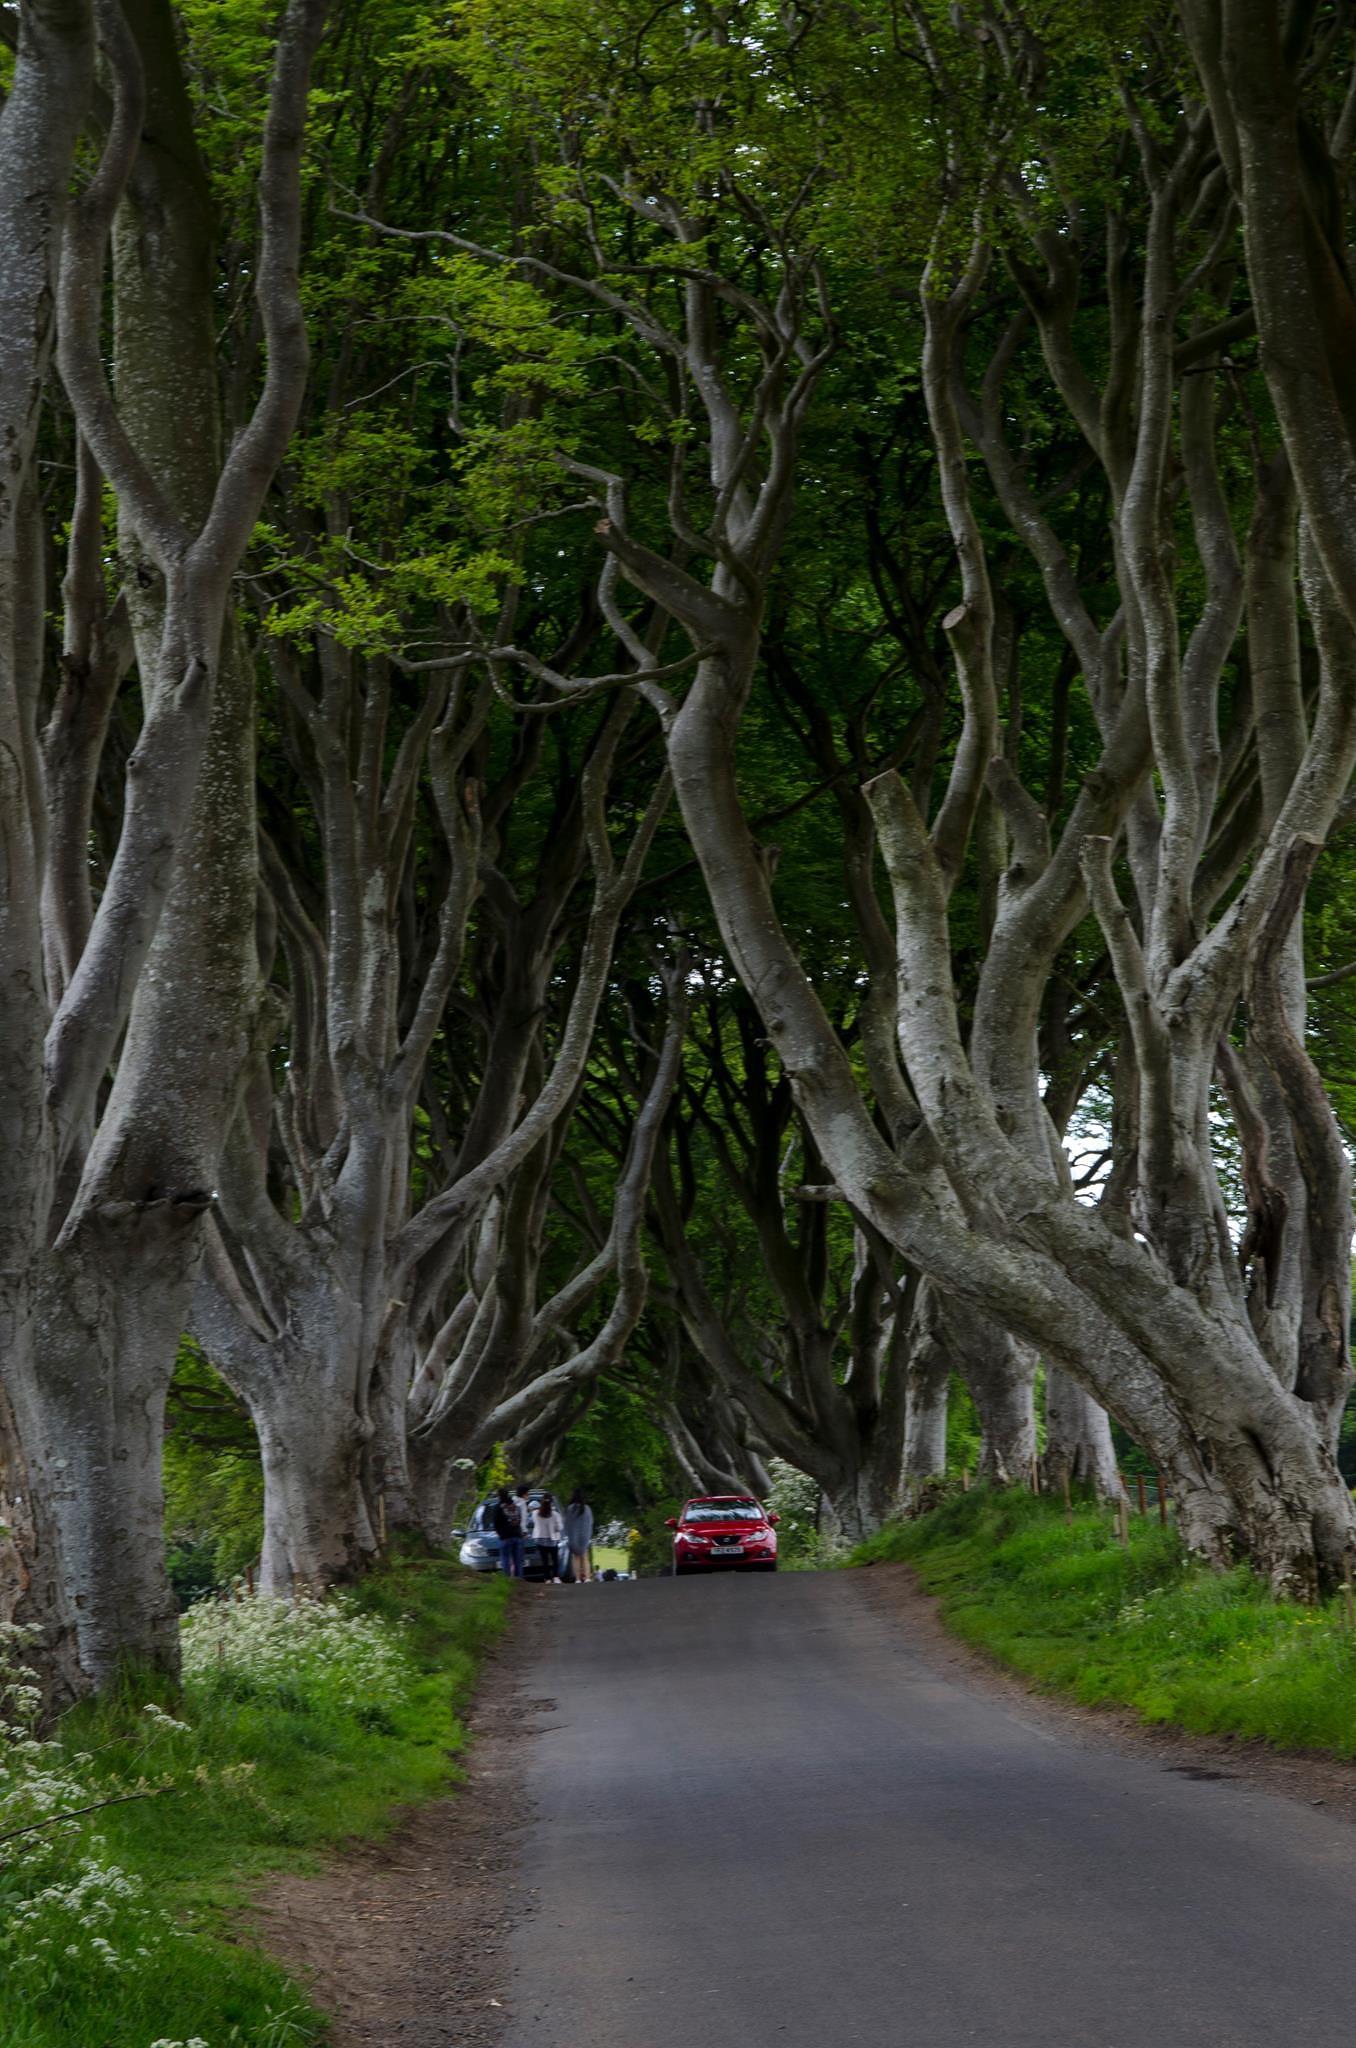 The Dark Hedges, N. Ireland by Jerbear